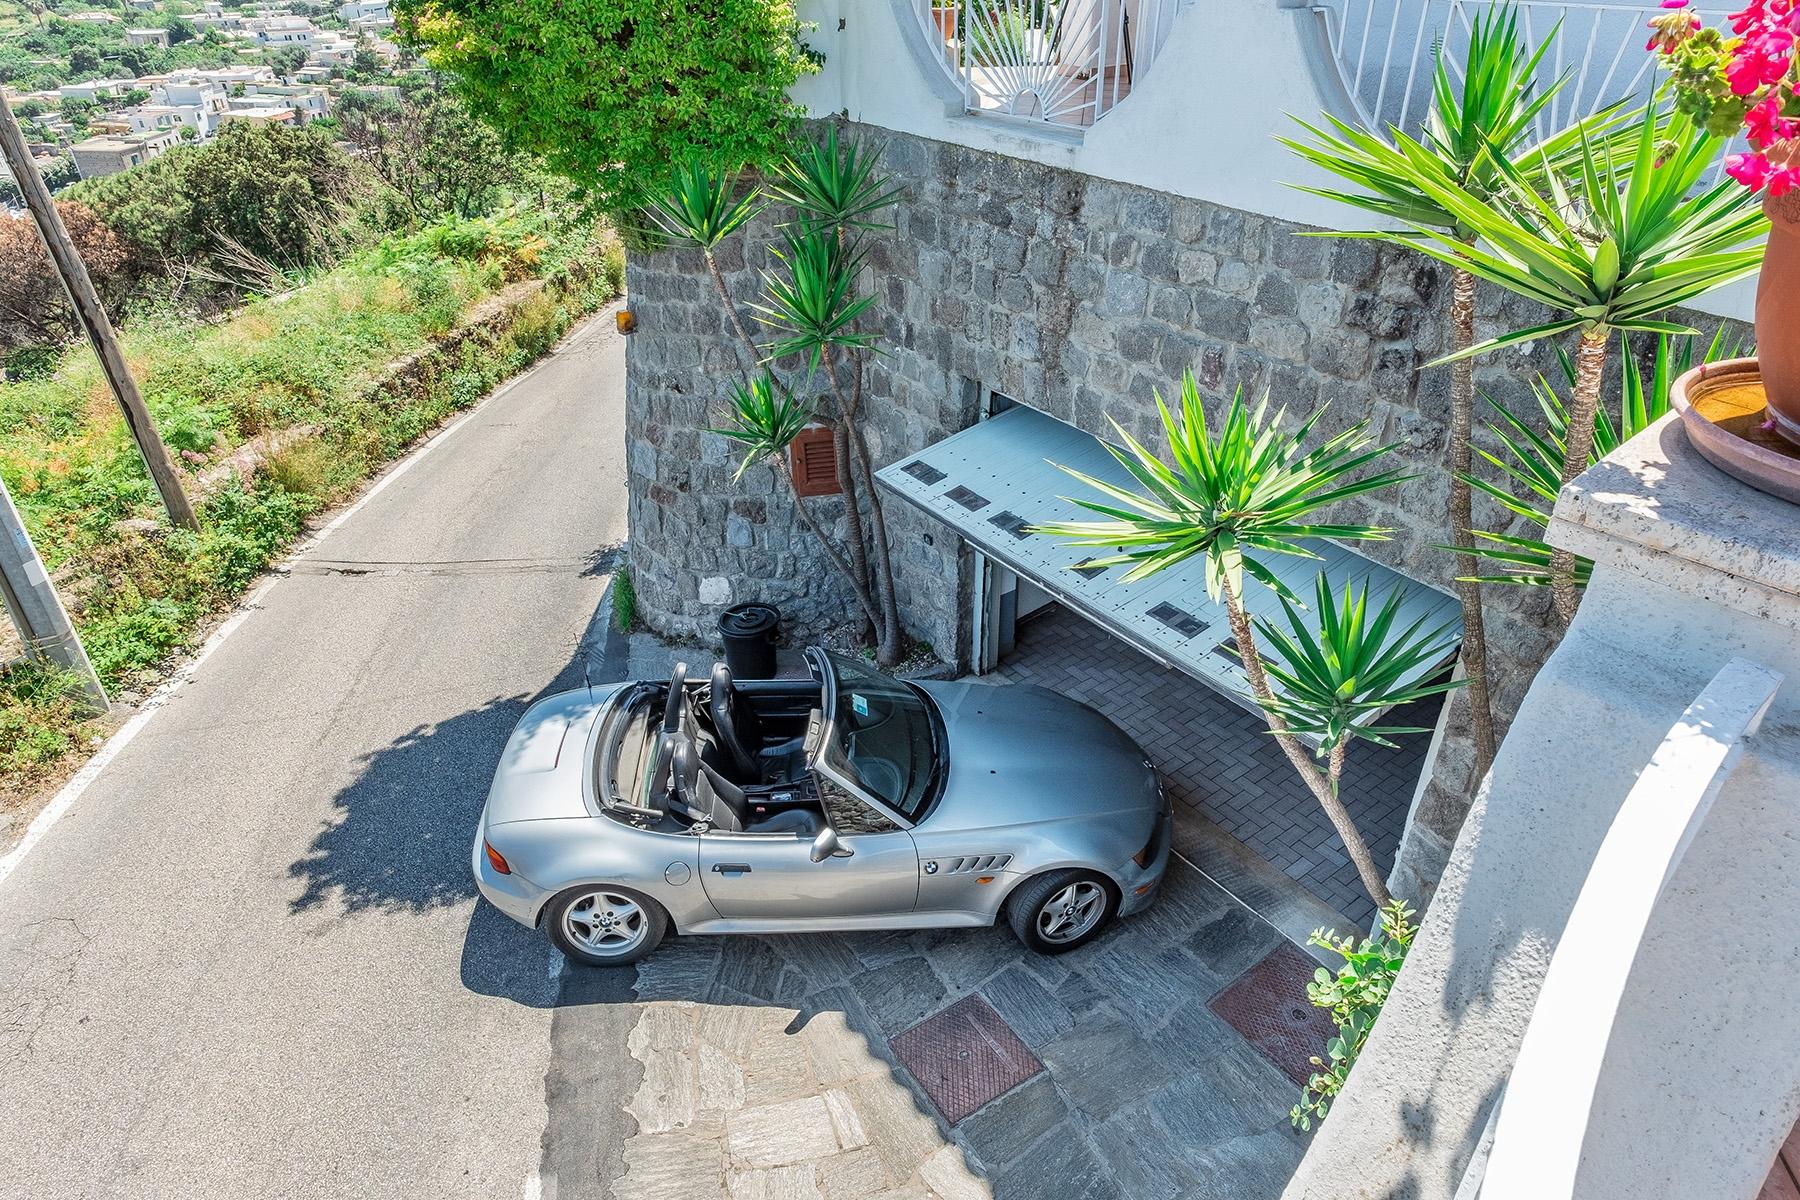 Villa in Vendita a Ischia: 5 locali, 138 mq - Foto 9